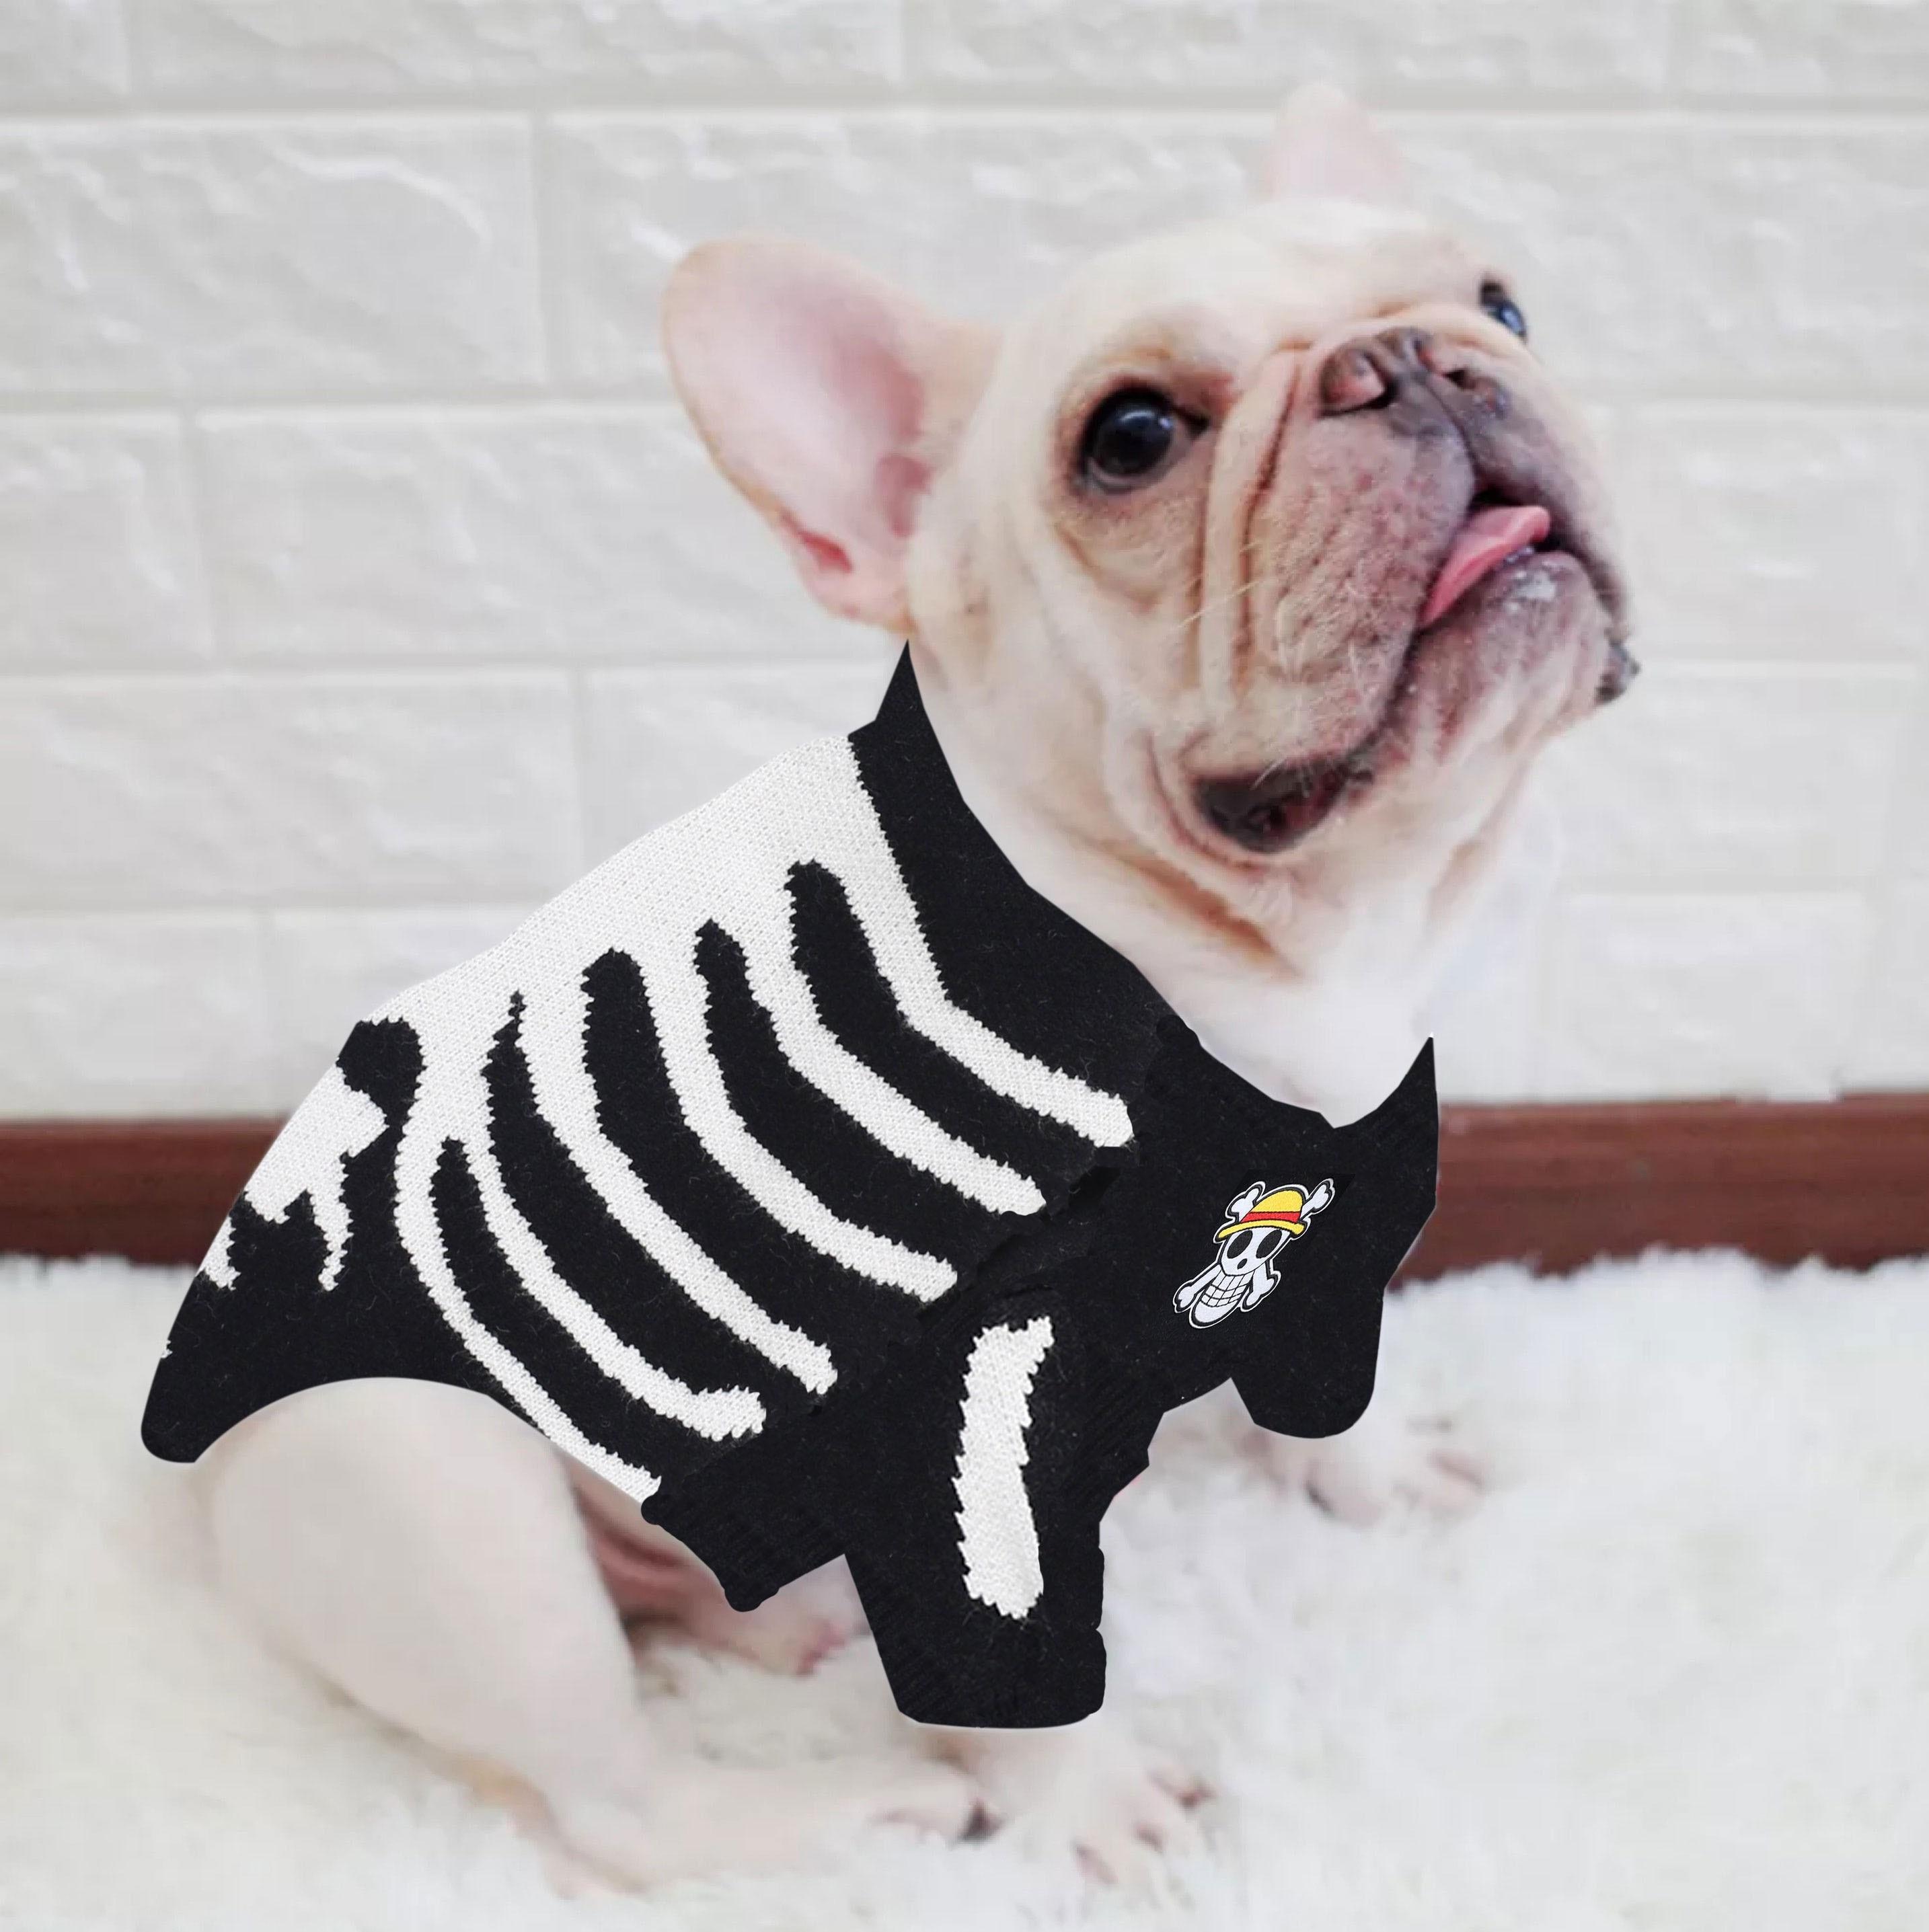 Halloween Hond Trui Classic Pet Casual Outfit Kostuum Mode Vest Trui Gebreid Voor Schnauzer Bulldog Puppy Kleding